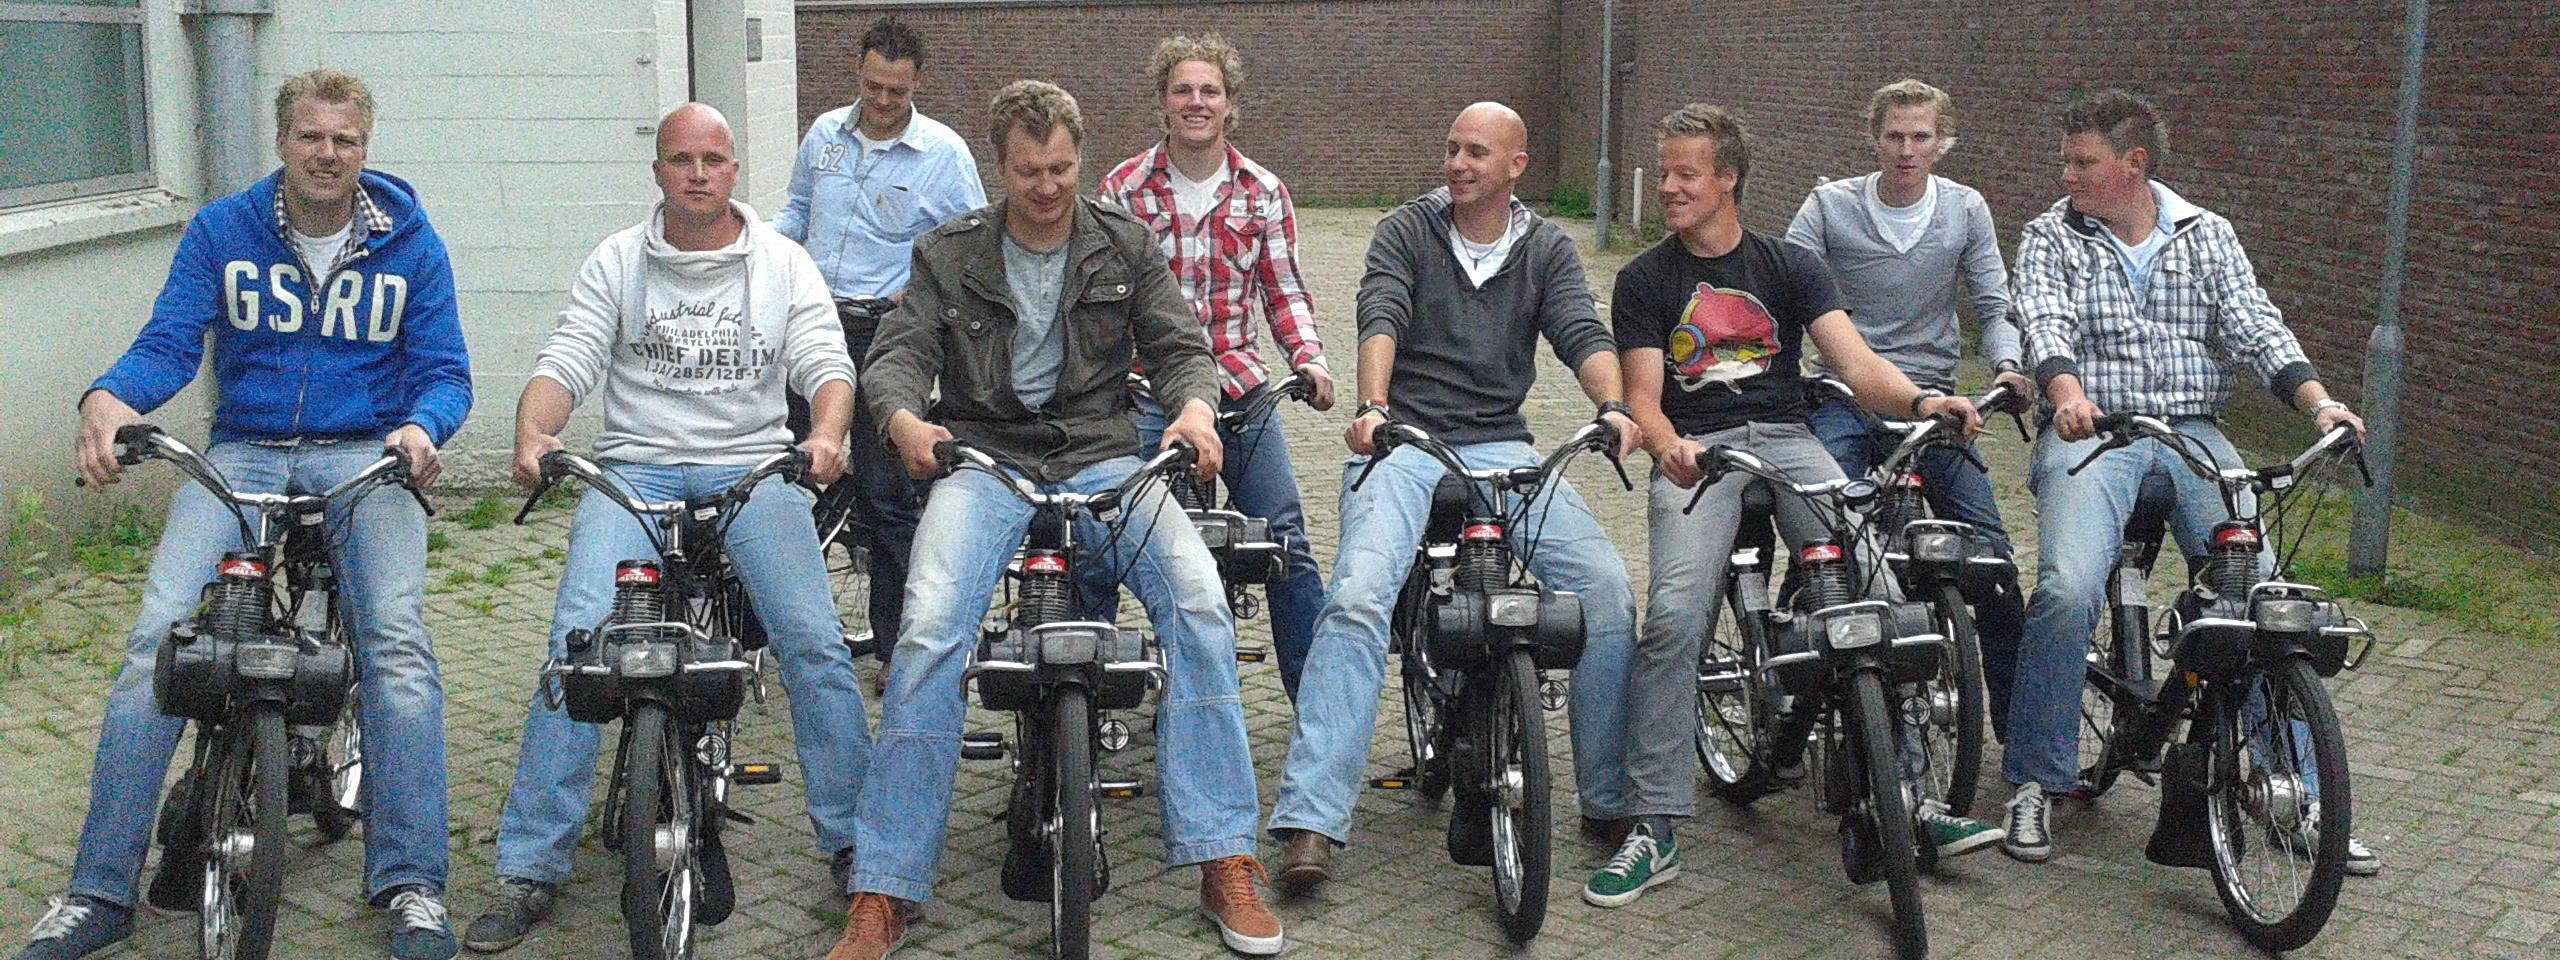 Solexing beleving Eindhoven